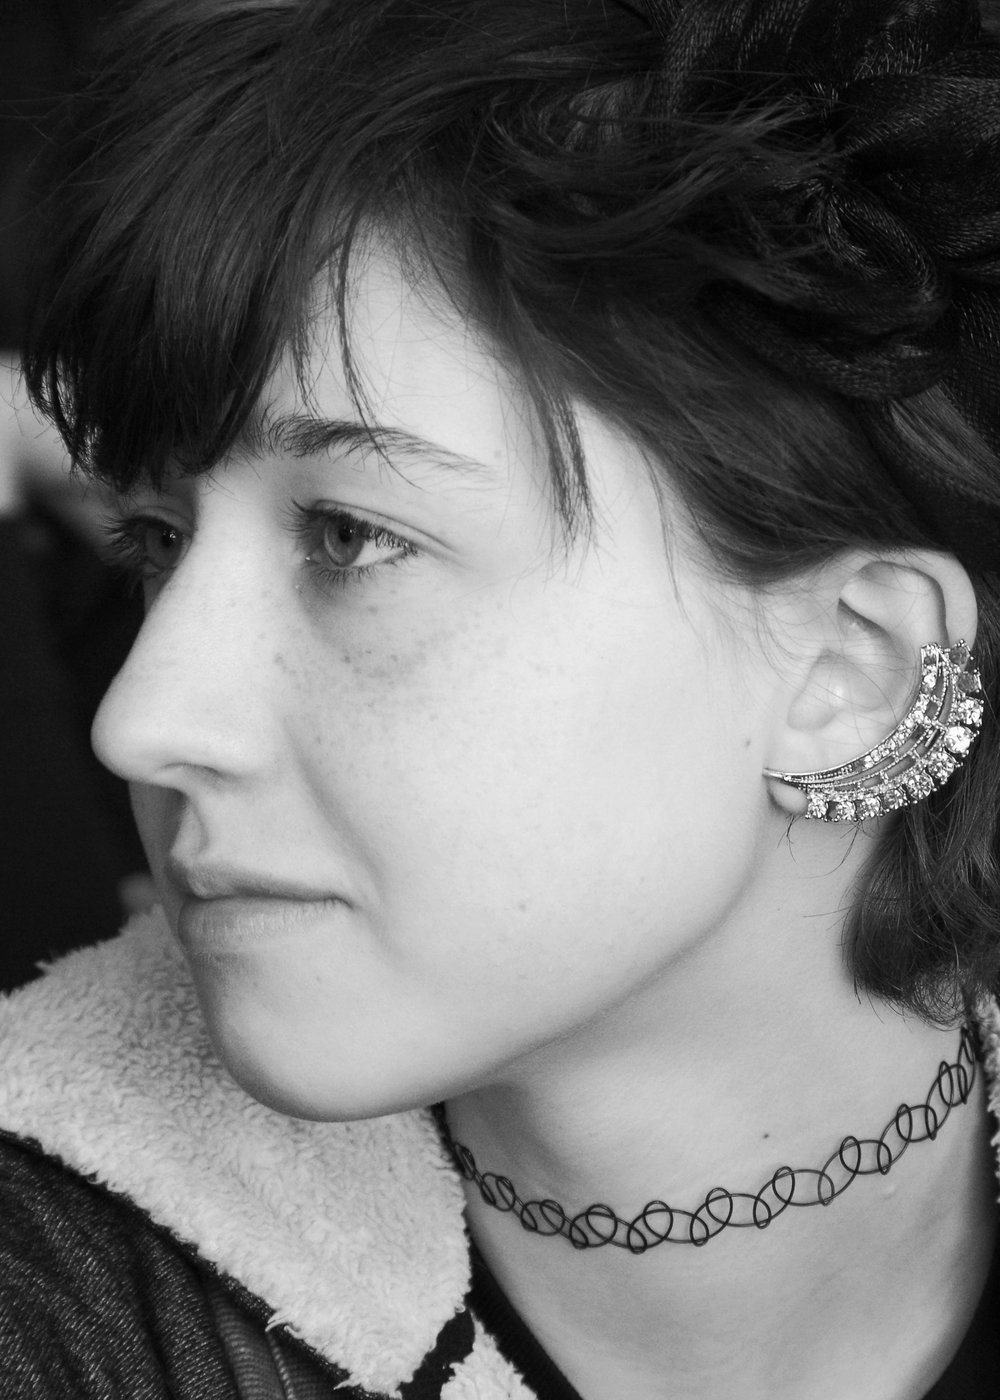 Rae antczak - Age:195'8